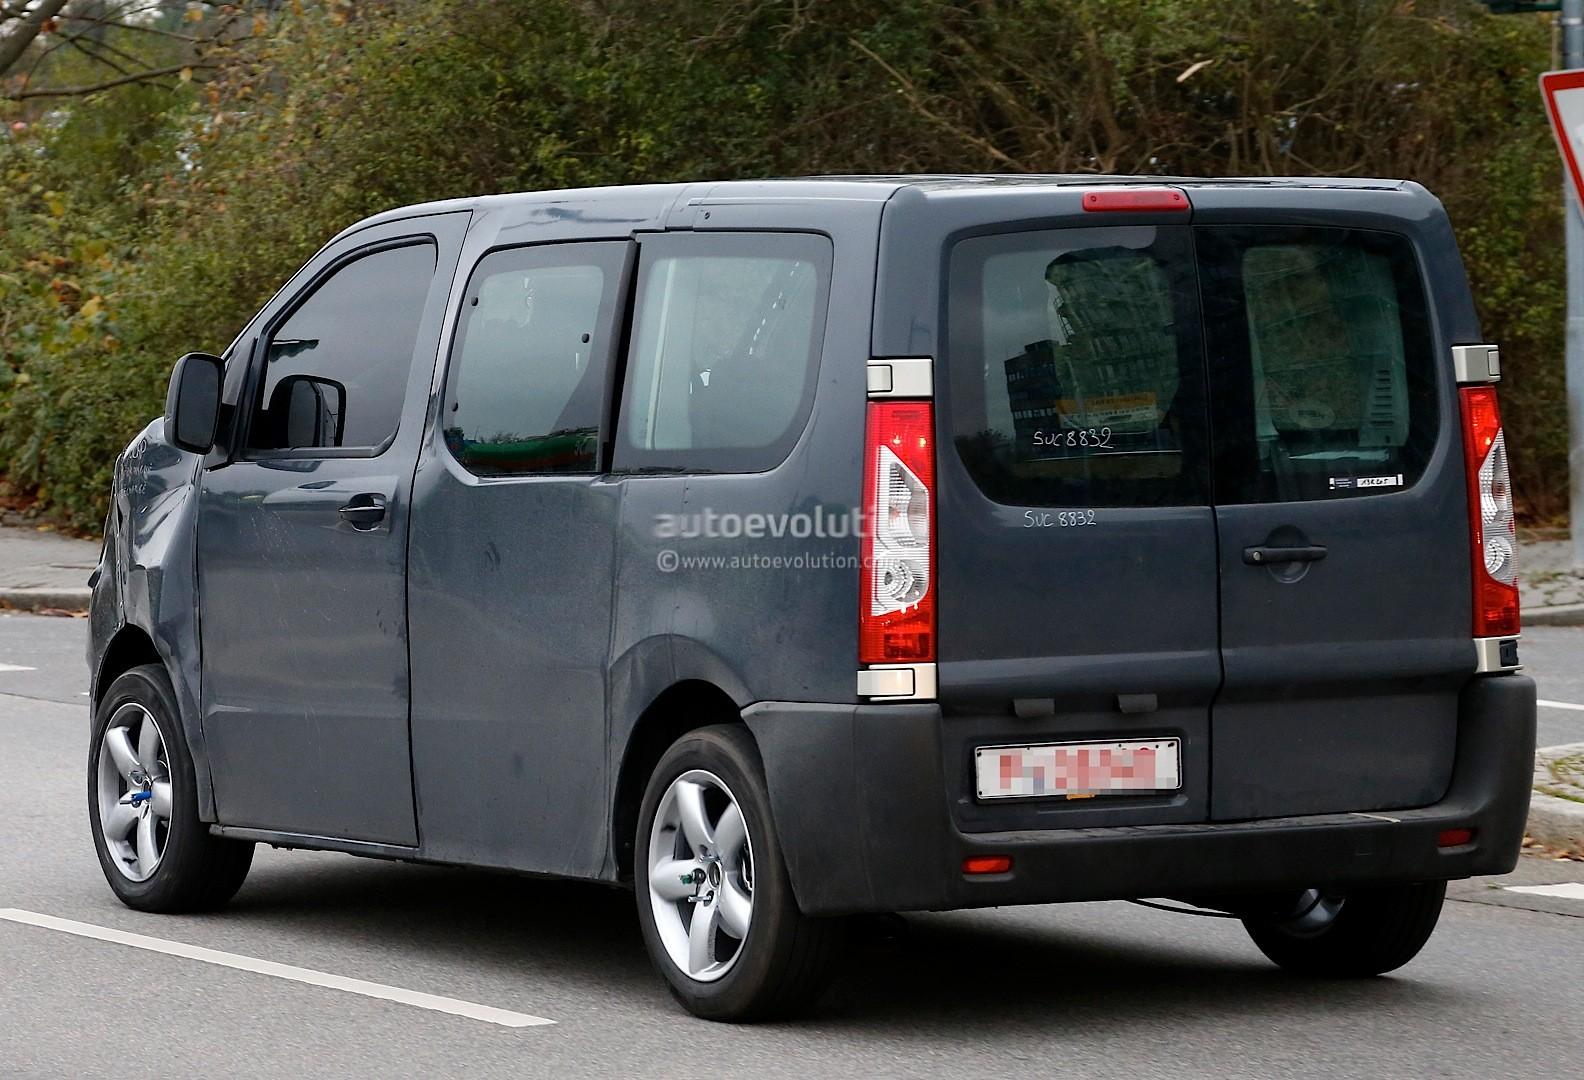 2016 - [Citroën/Peugeot/Toyota] SpaceTourer/Traveller/ProAce Spyshots-new-citroen-jumpy-takes-cues-from-2011-tubik-concept-1080p-7